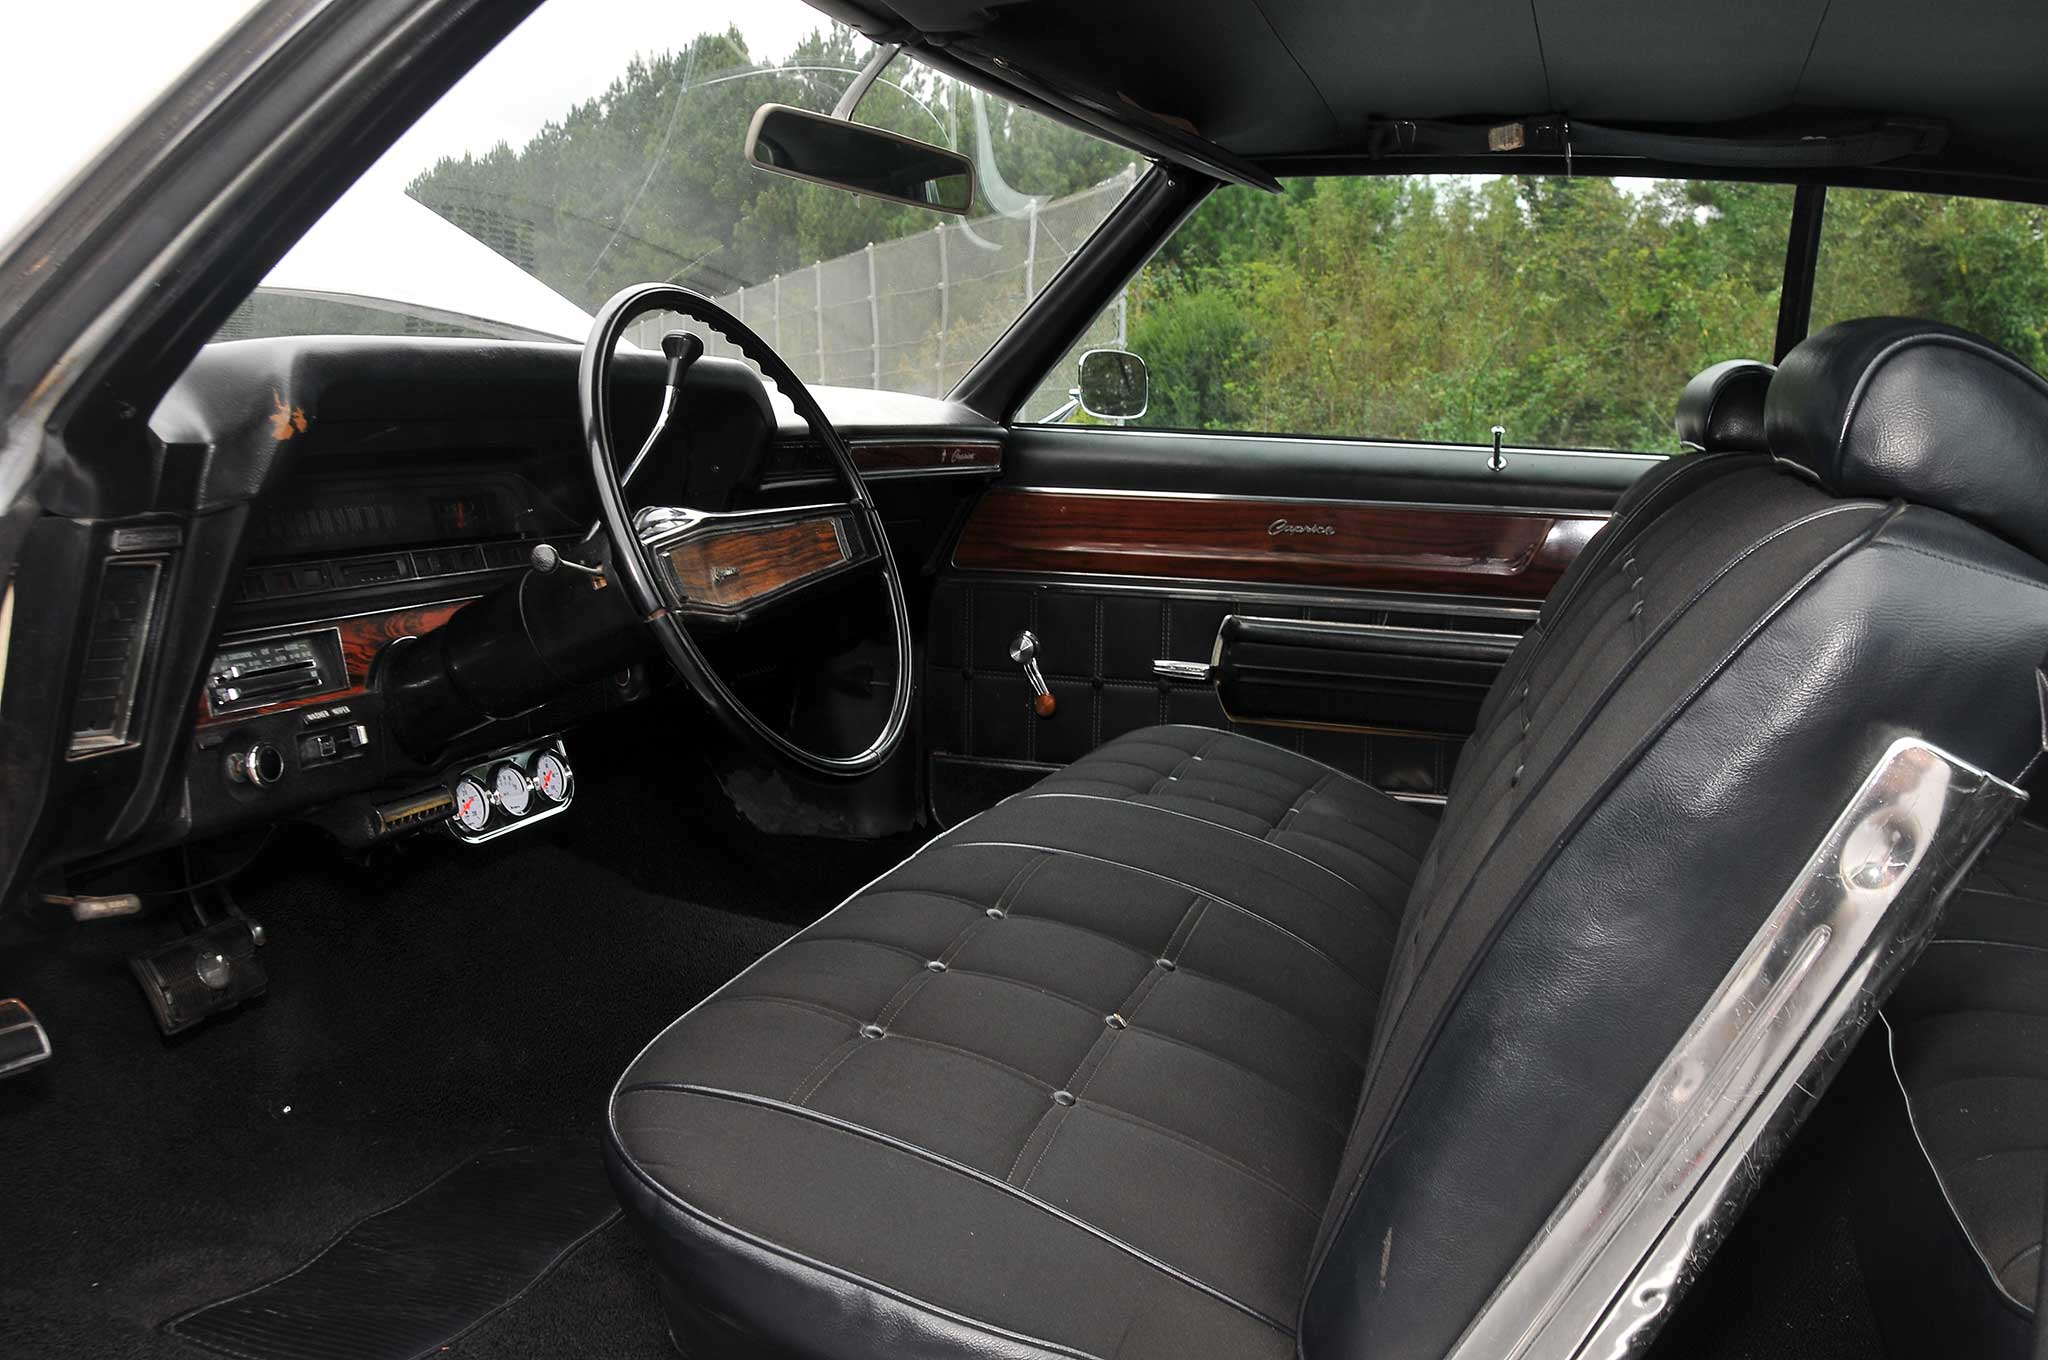 1970 Chevrolet Caprice - OCD Caprice - Lowrider